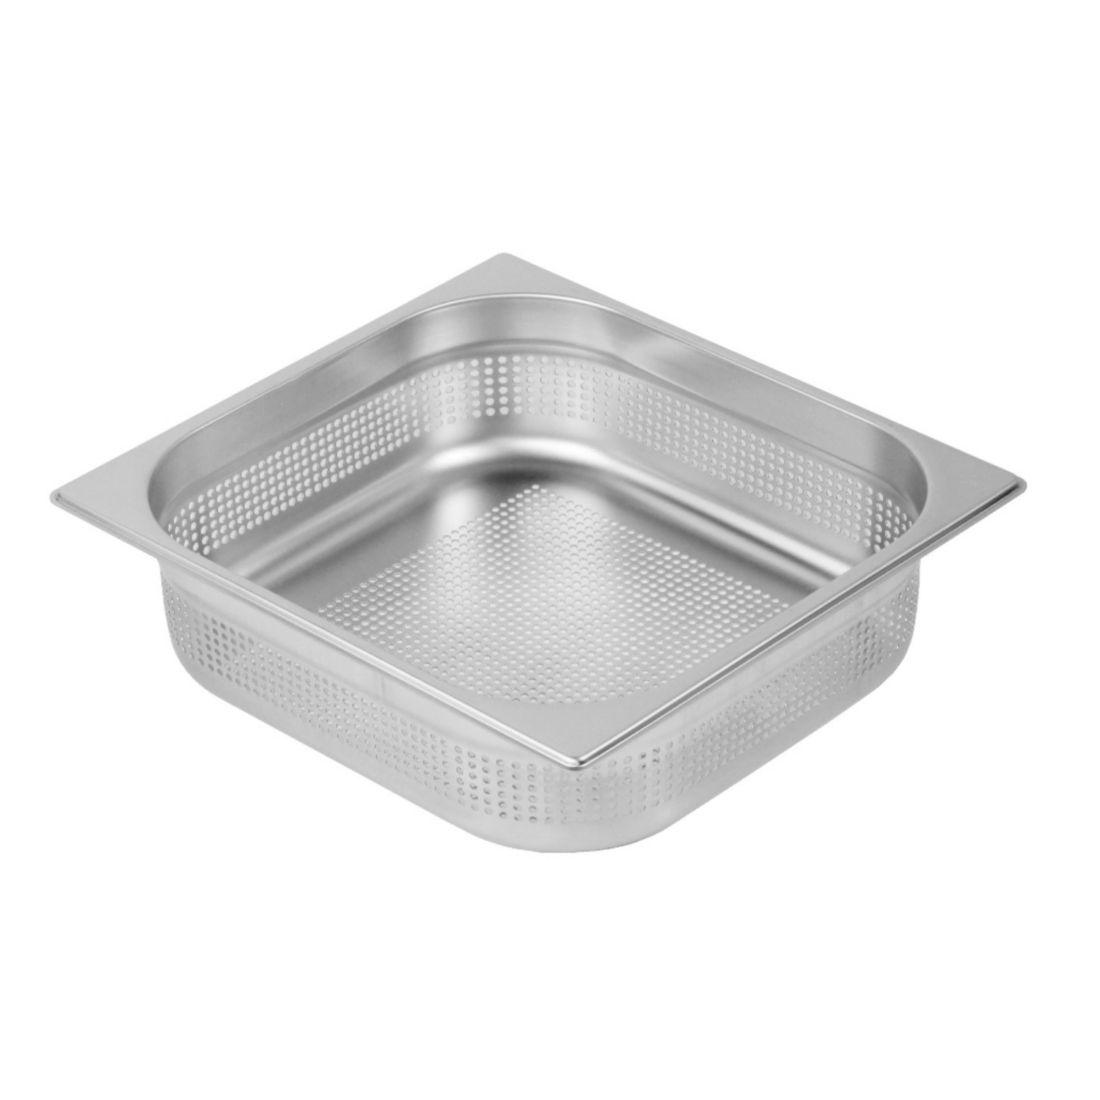 Gastronádoba Profi děrovaná GN 2/3 065 mm